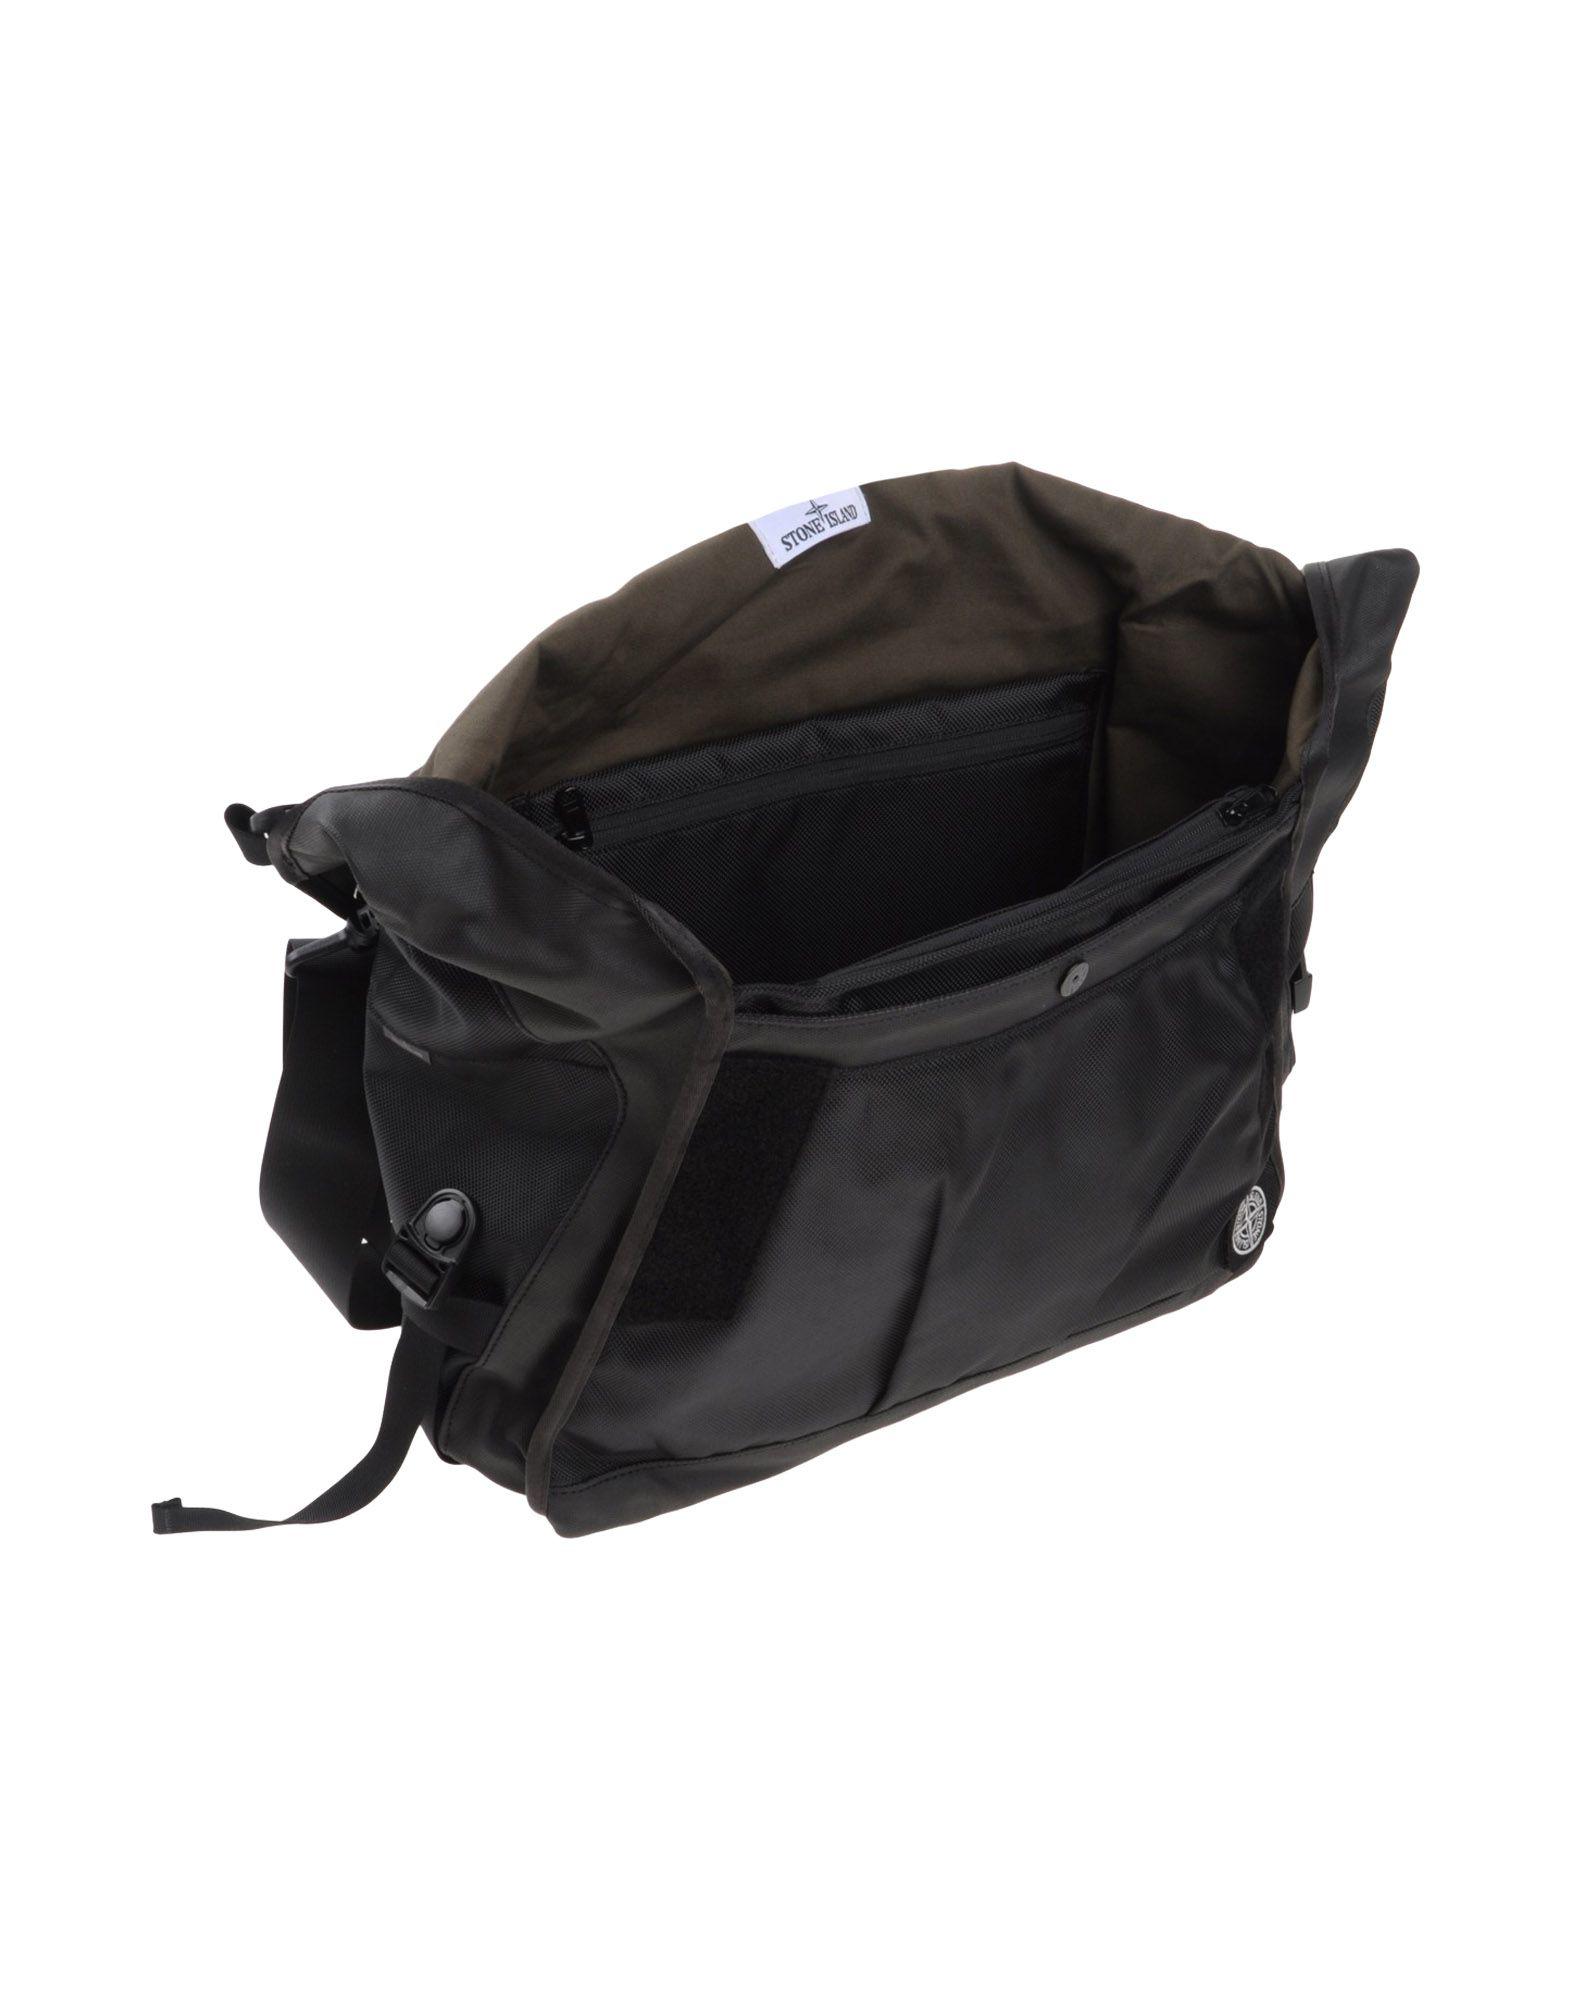 Stone Island Cross Body Bag In Black For Men Lyst